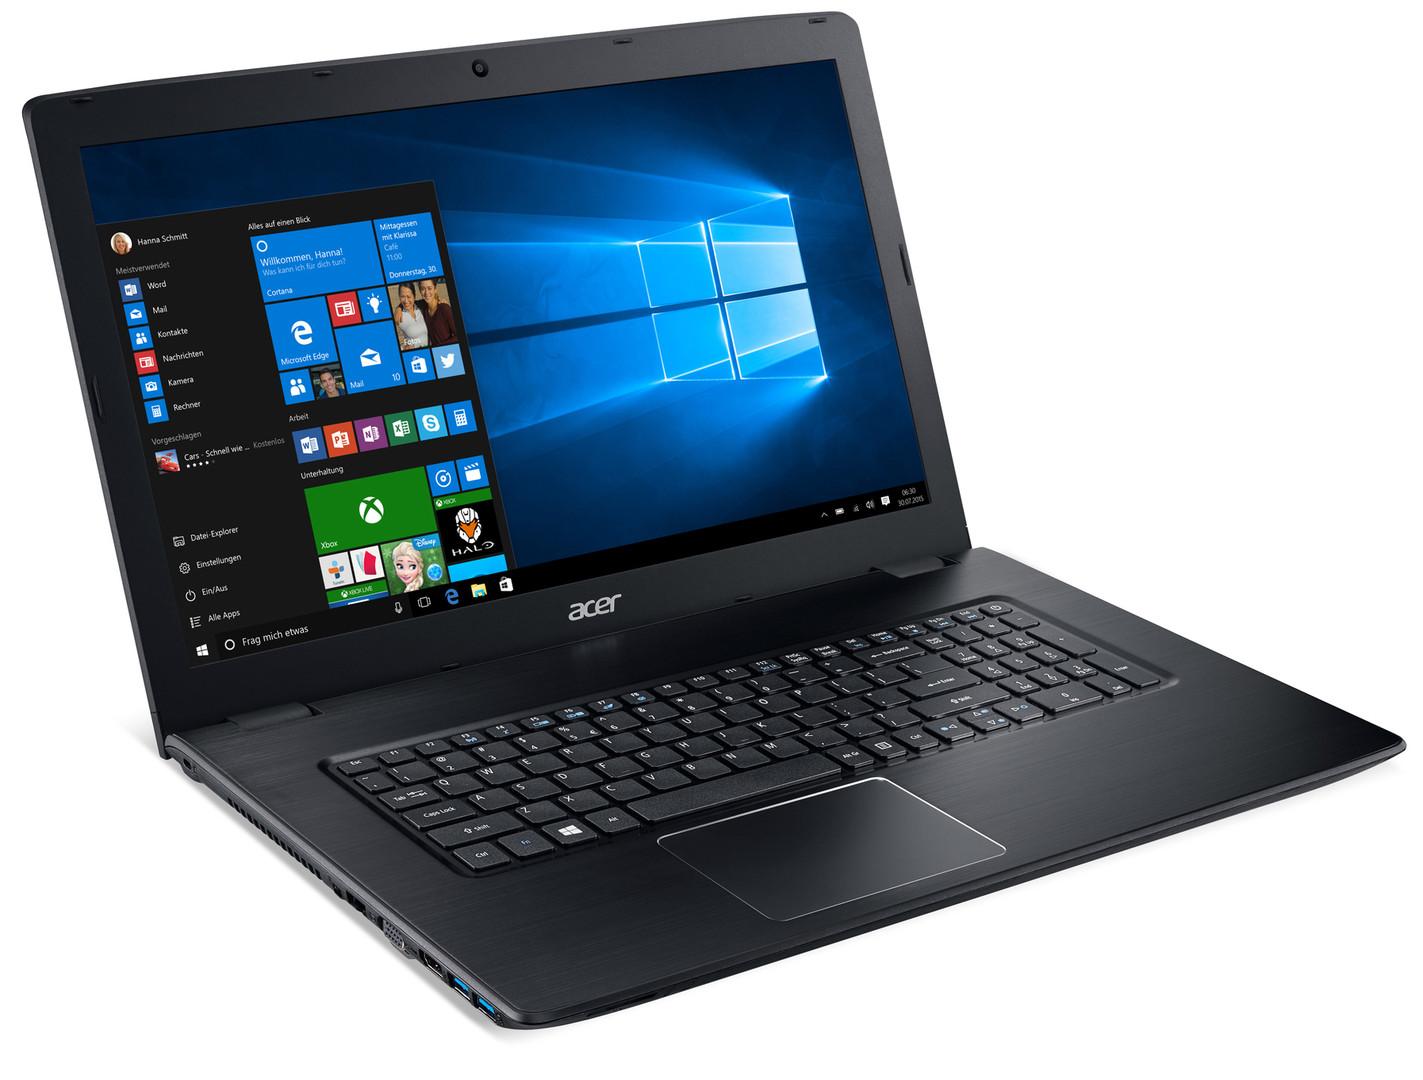 Acer Aspire E5-774G-78NA (GeForce 940MX GDDR5) Notebook